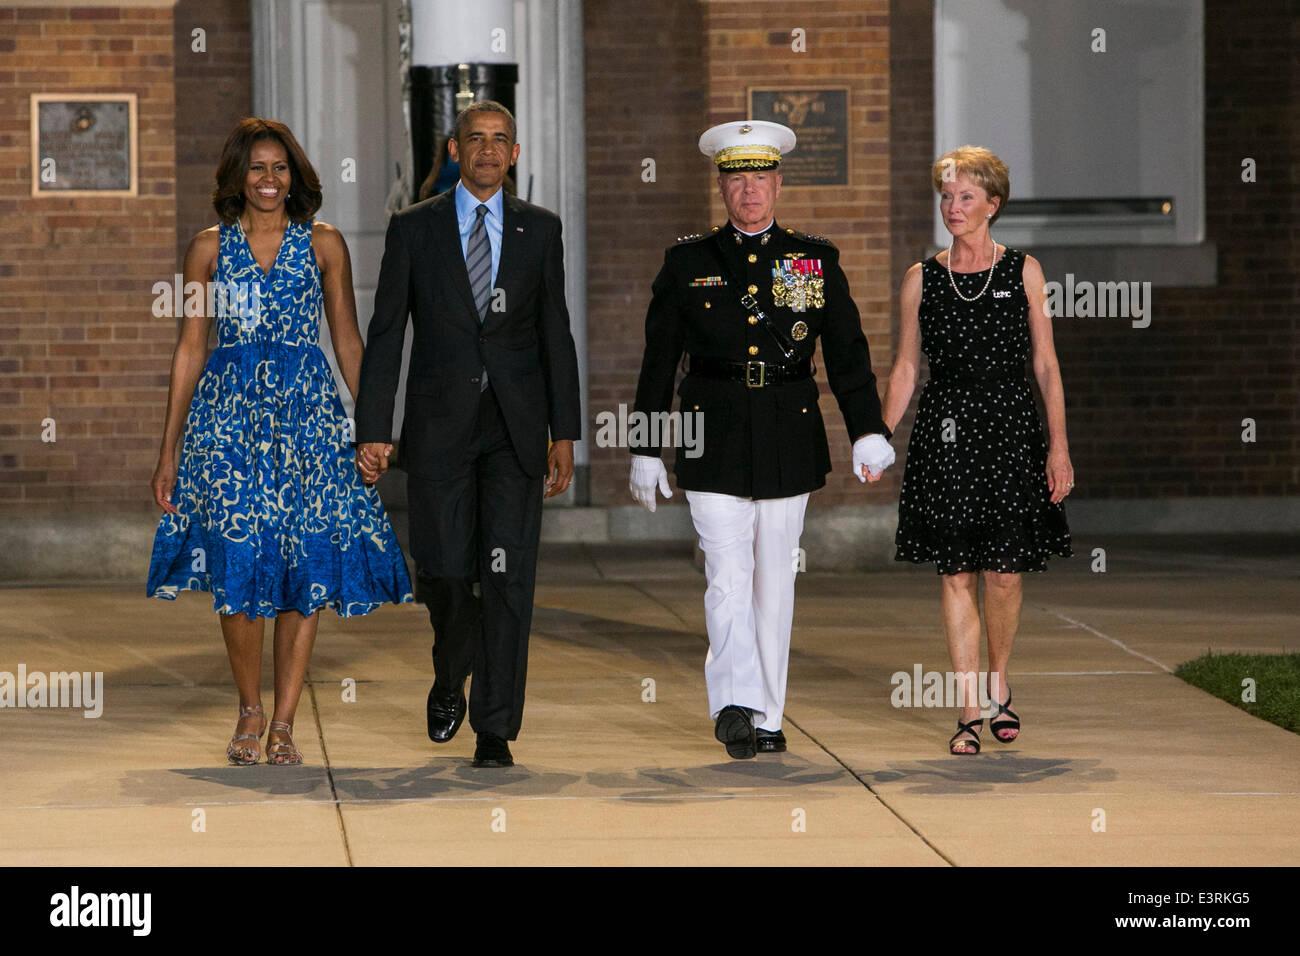 Washington, DC. 27th June, 2014. United States President Barack Obama, left, First Lady Michelle Obama, center left, Stock Photo